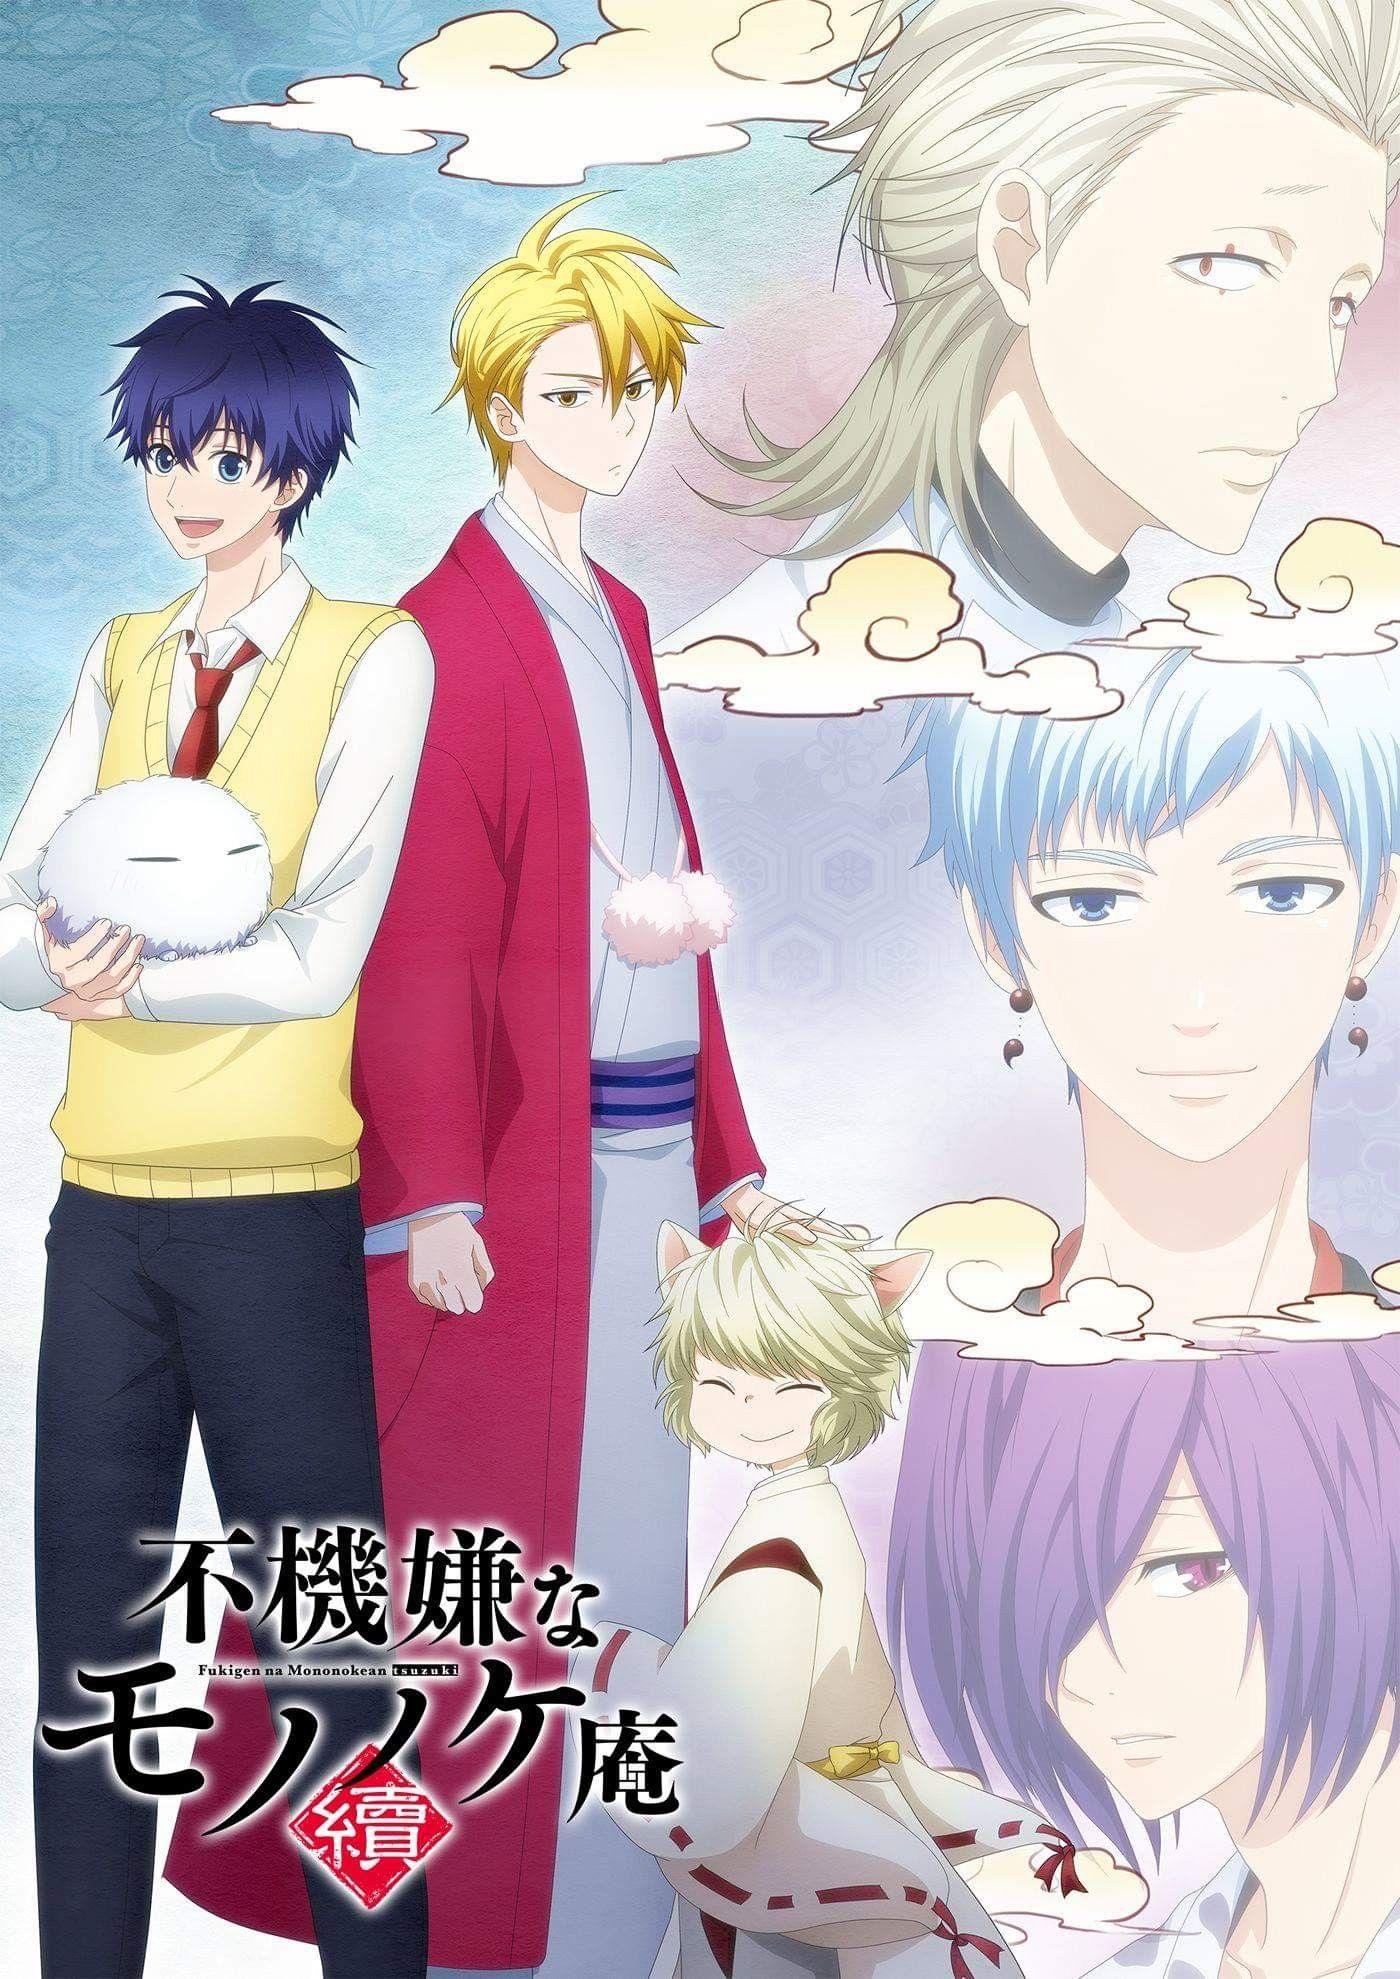 FB_IMG_1540775379803 Anime, Anime episodes, Anime movies